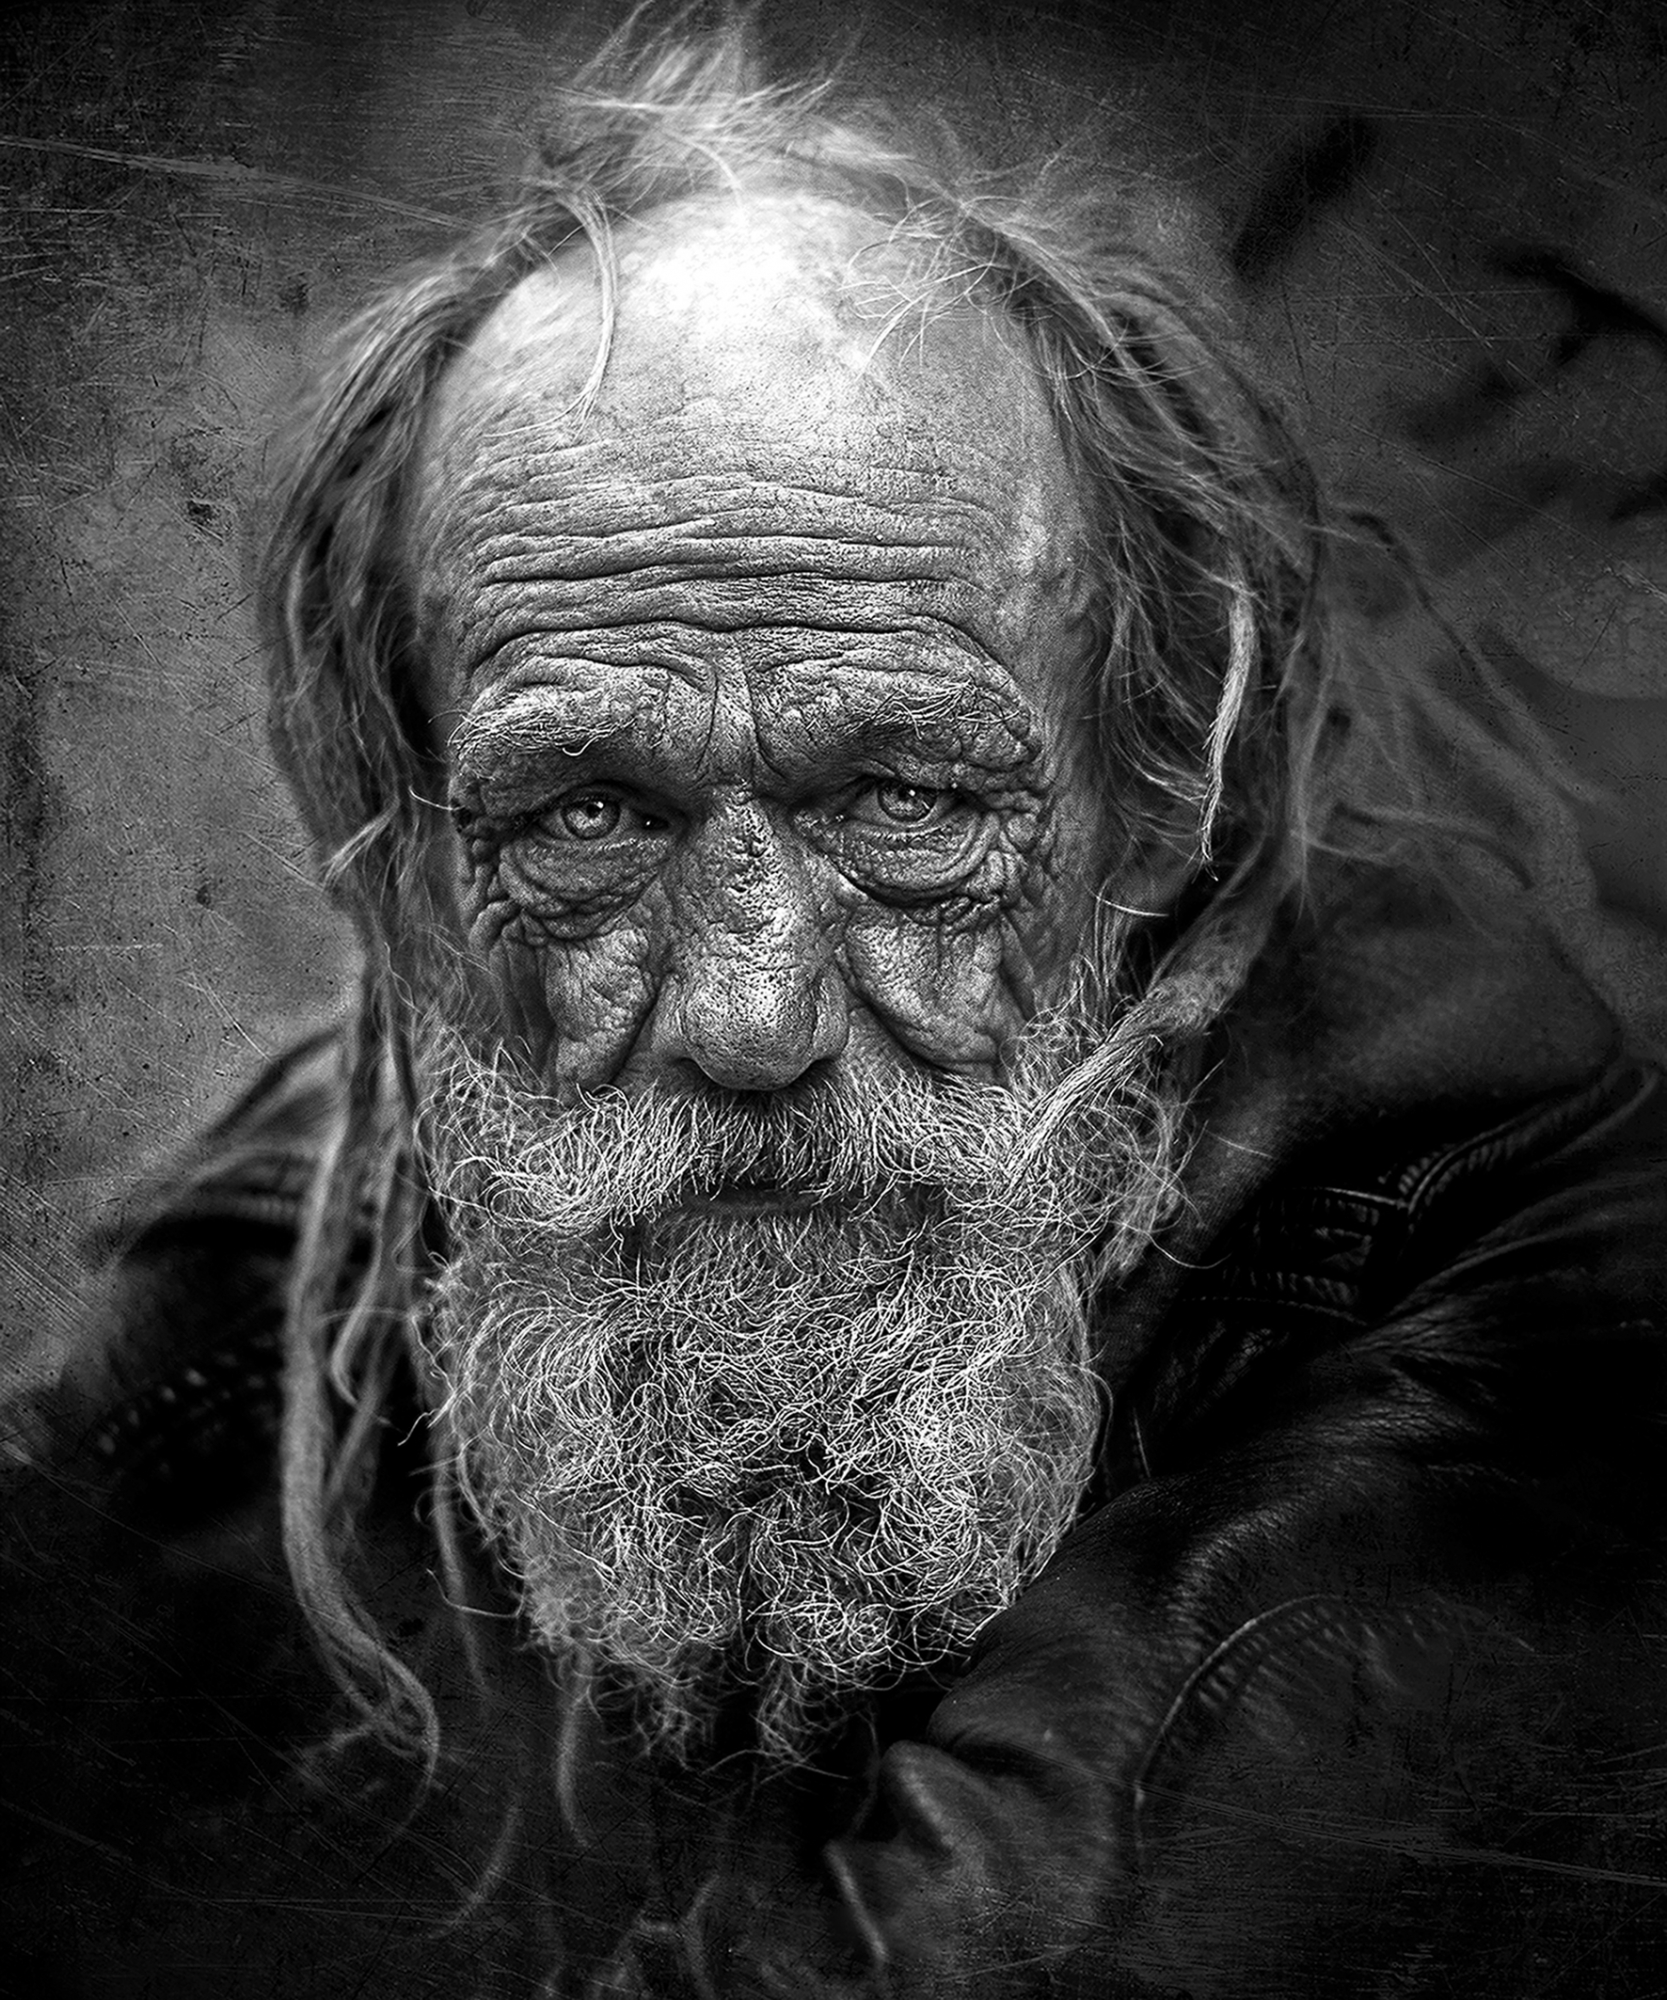 Thomas, homeless di Pierferdinando Di Nuzzo